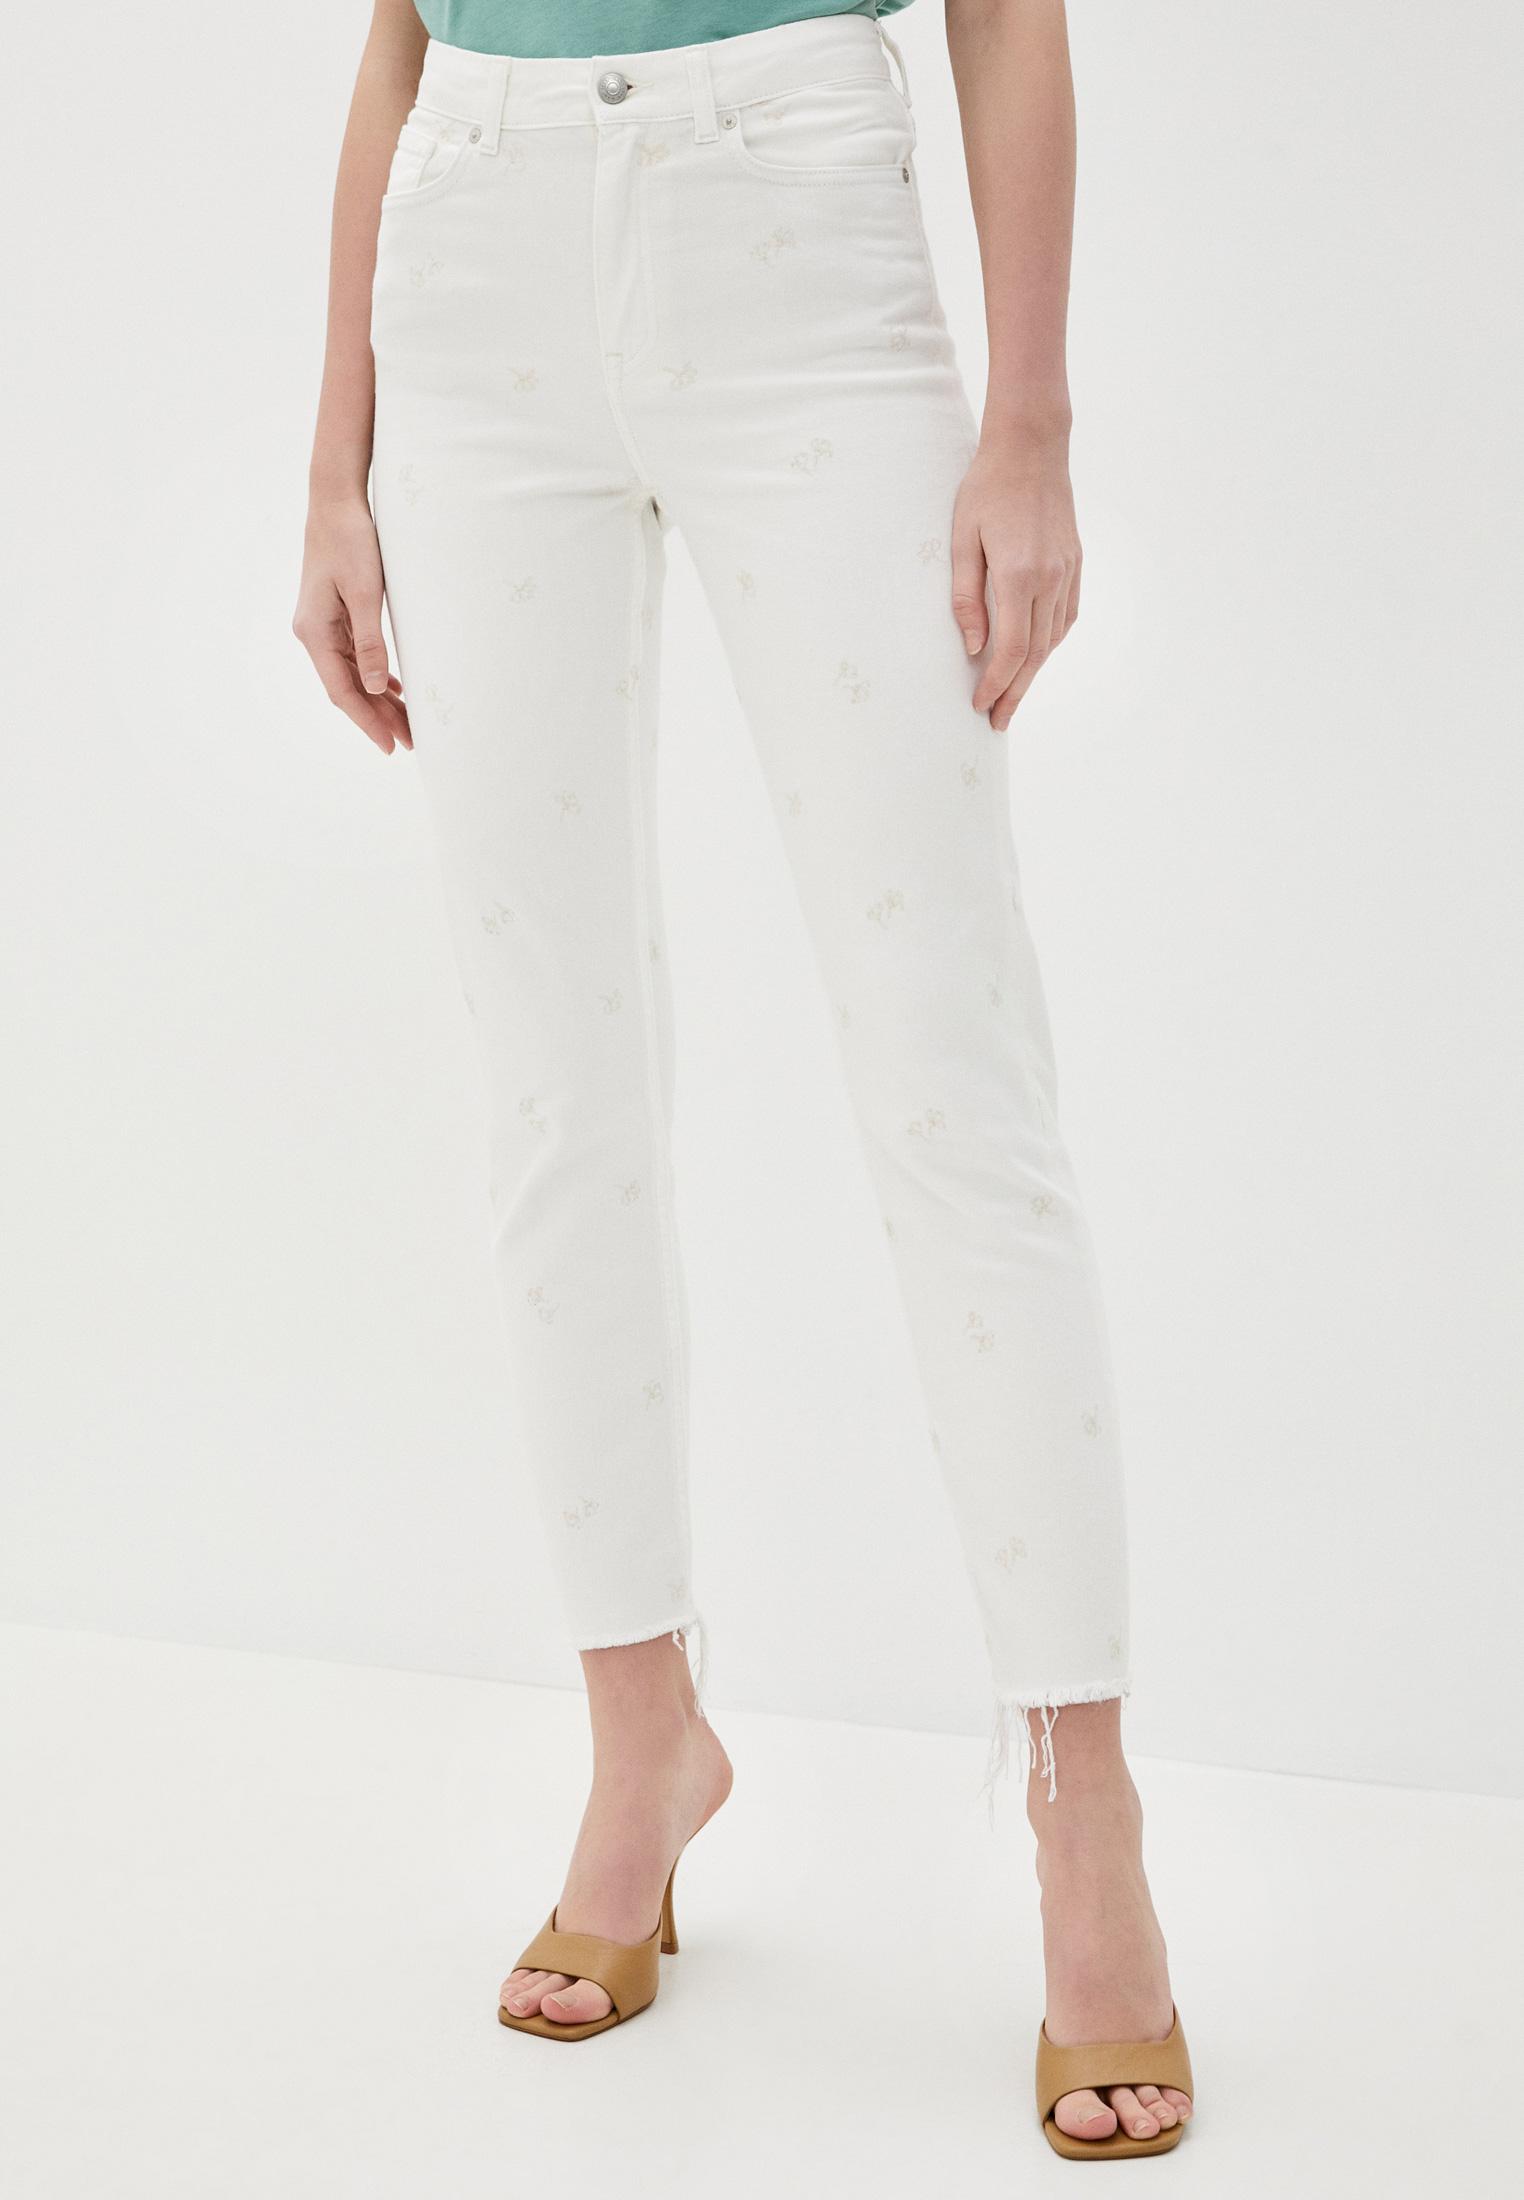 Зауженные джинсы Gant (Гант) 4100092